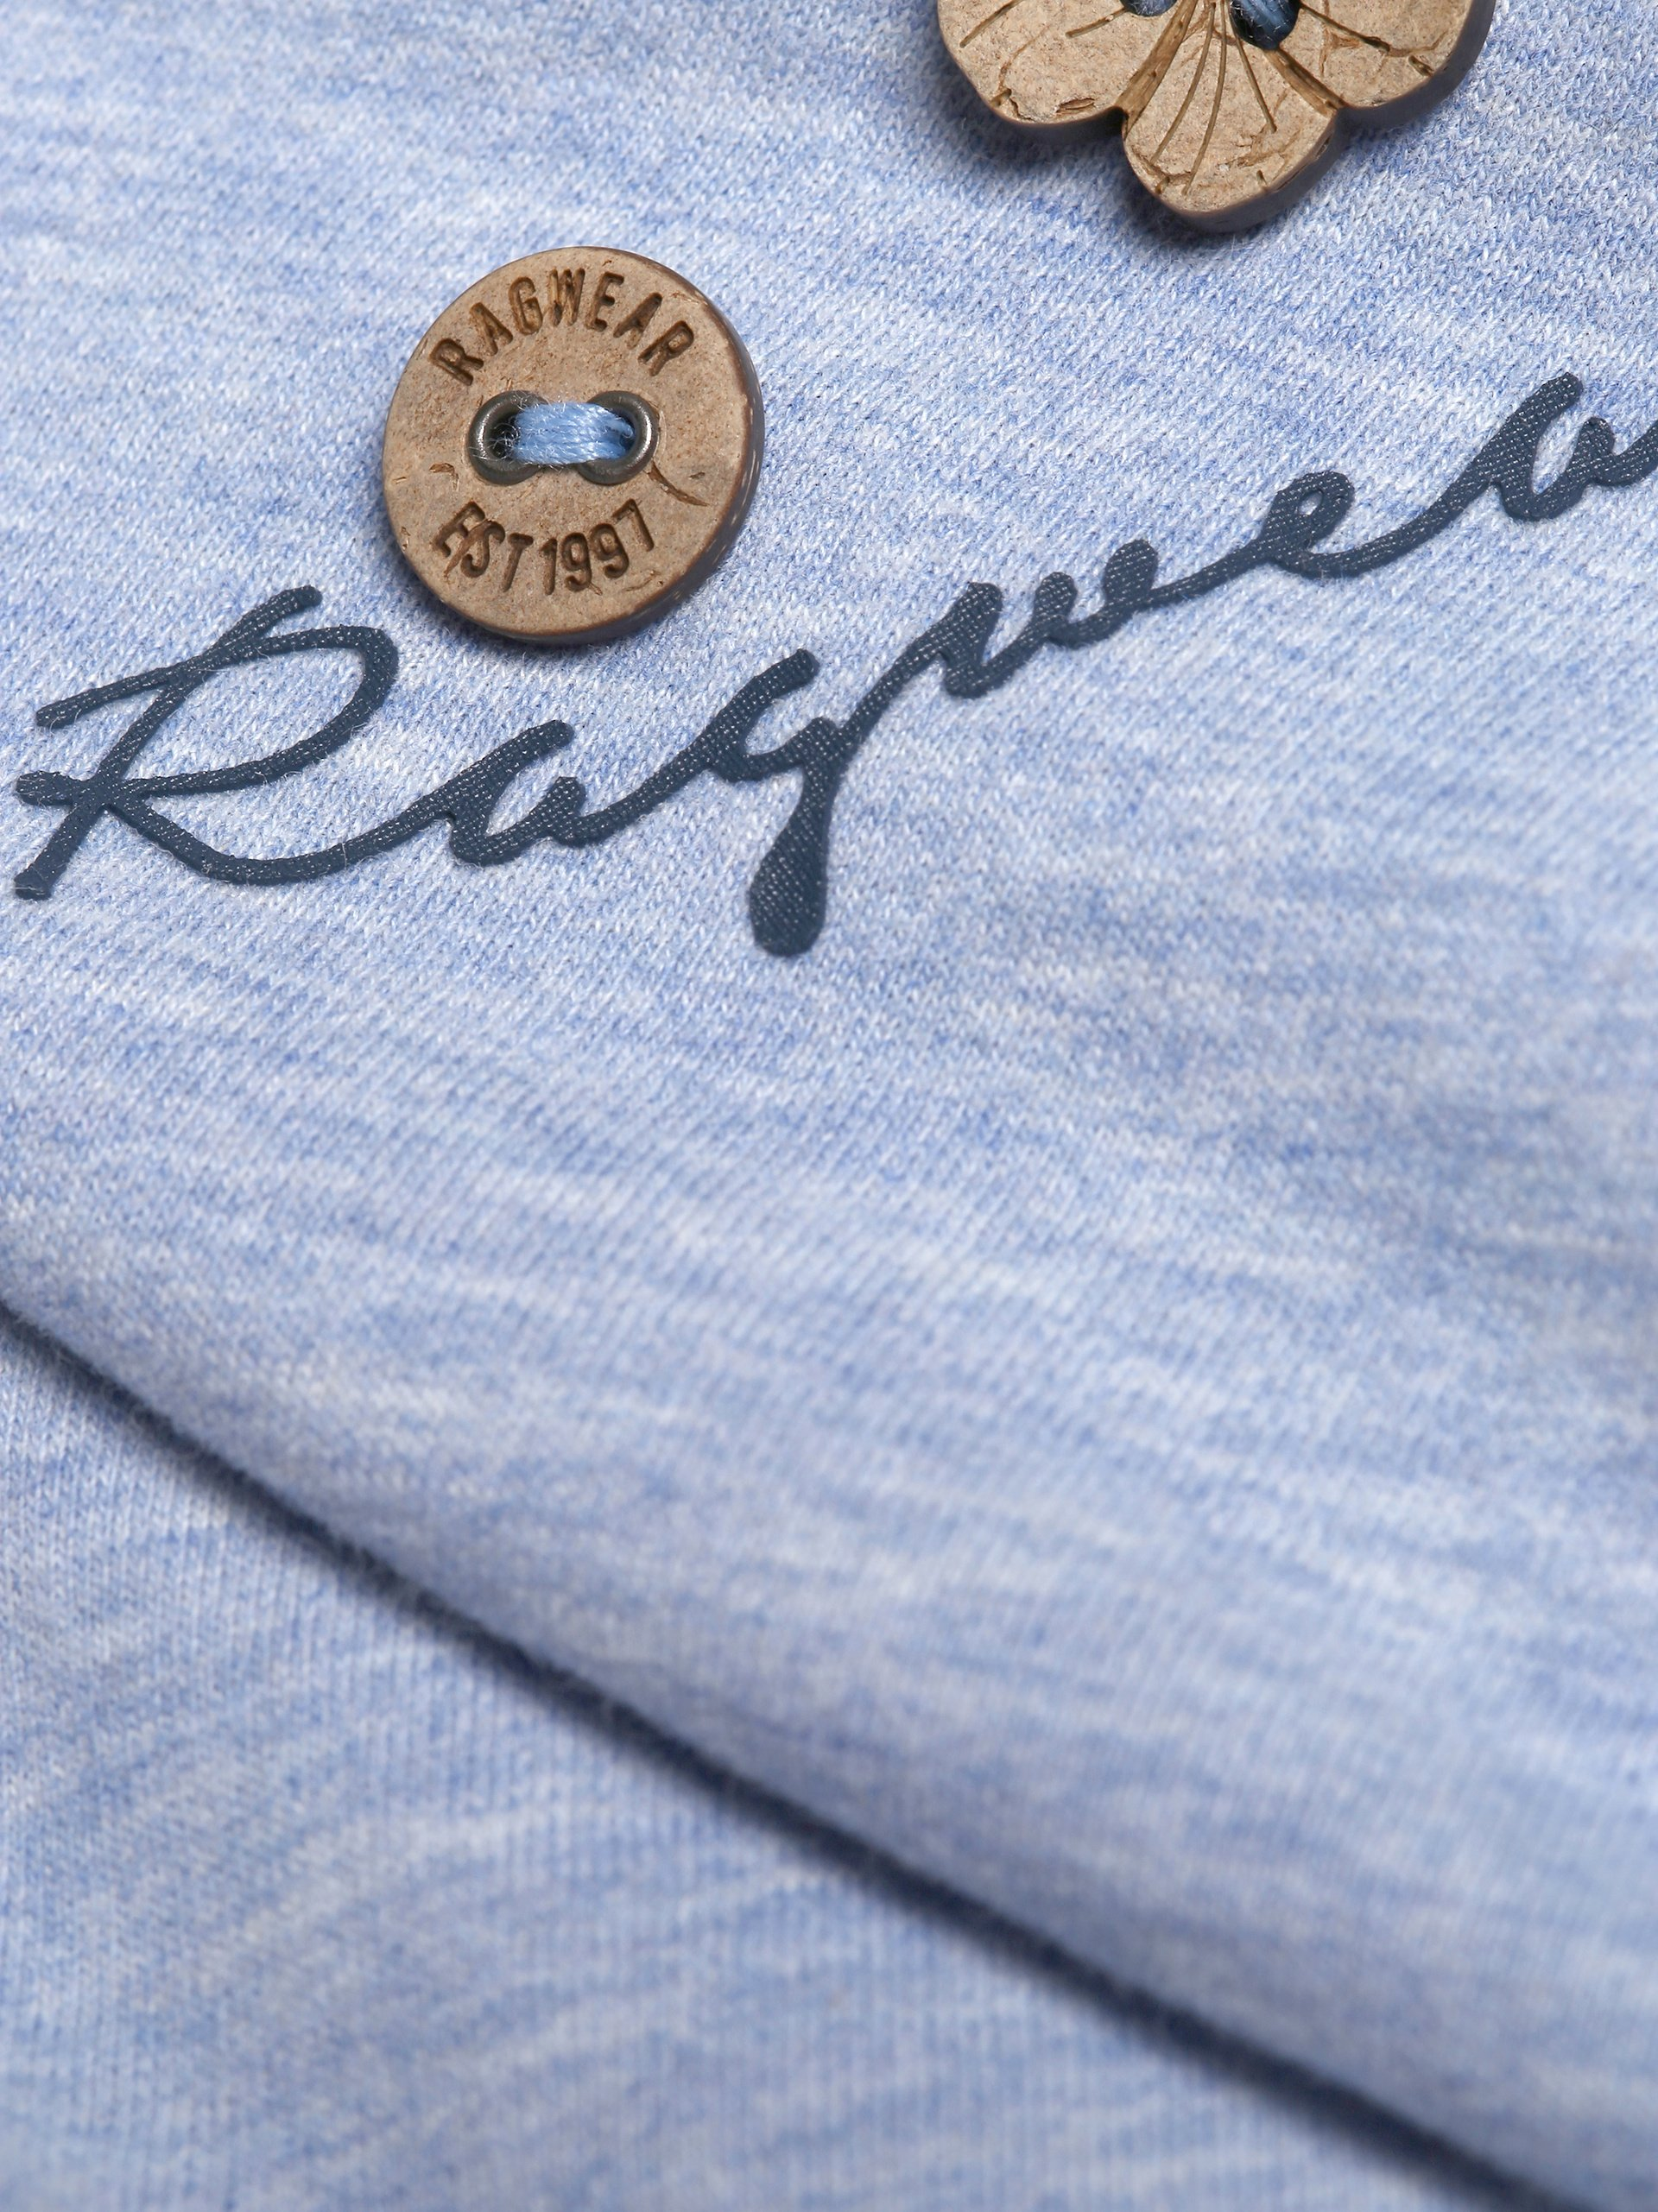 Ragwear Damen T-Shirt - Greta